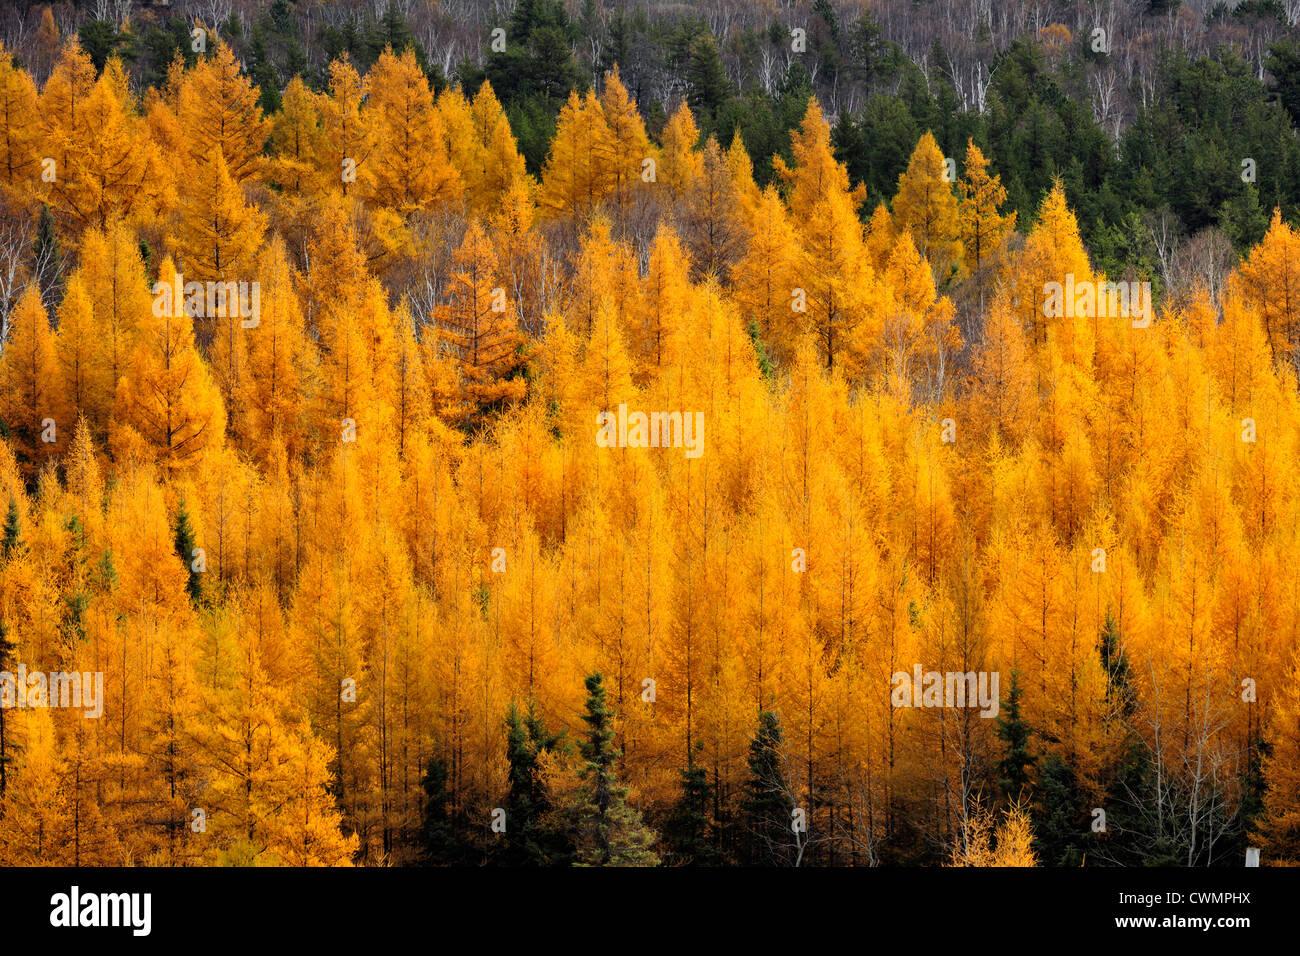 Eastern larches in autumn foliage, Greater Sudbury (Wahnapitae), Ontario, Canada Stock Photo